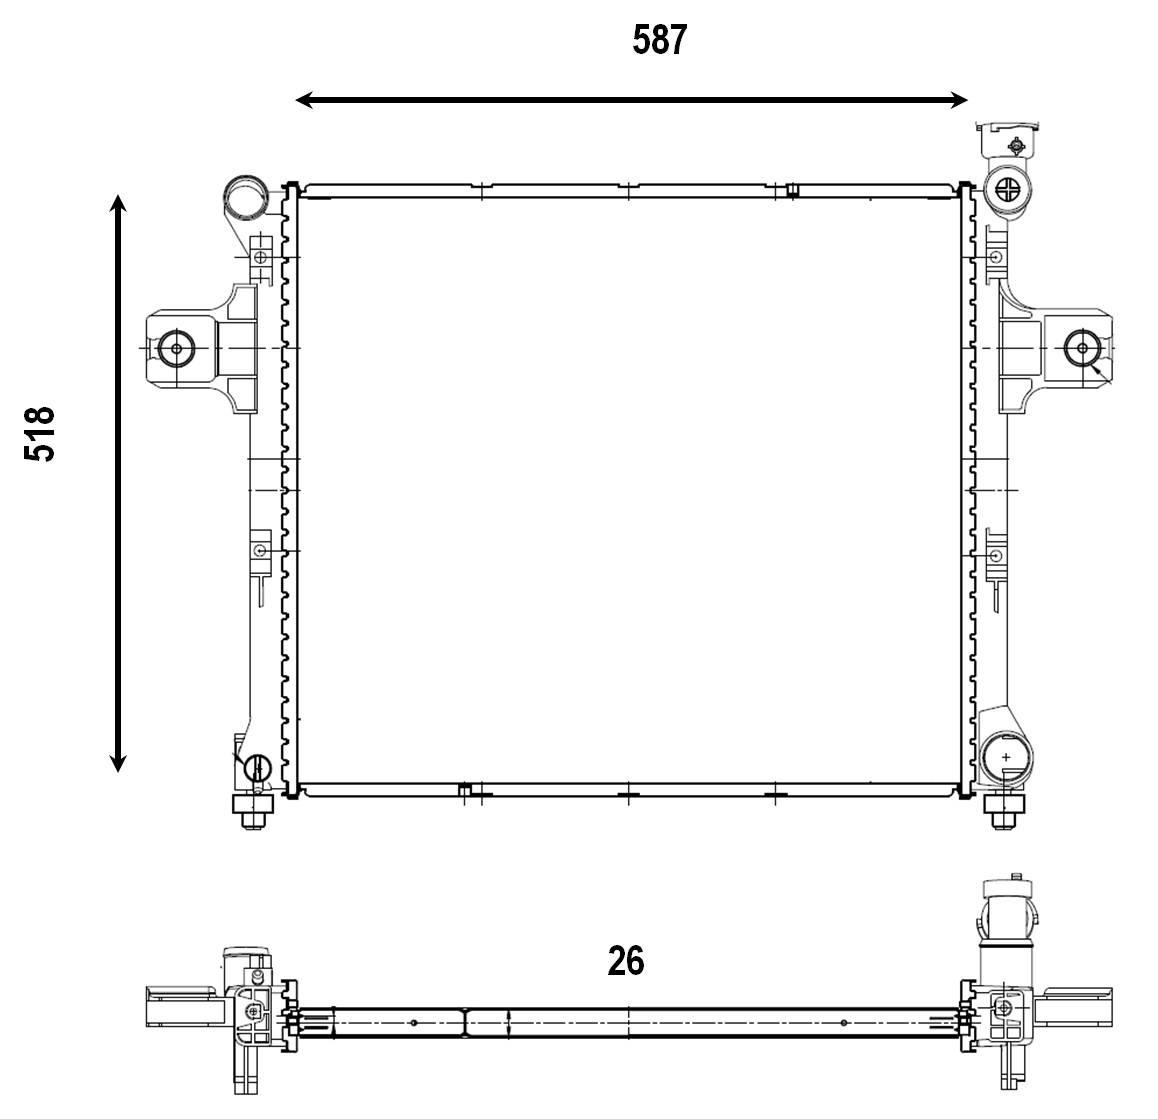 Jeep J20 Wiring Diagram | Wiring Diagram Jeep Hurricane Wiring Diagram on